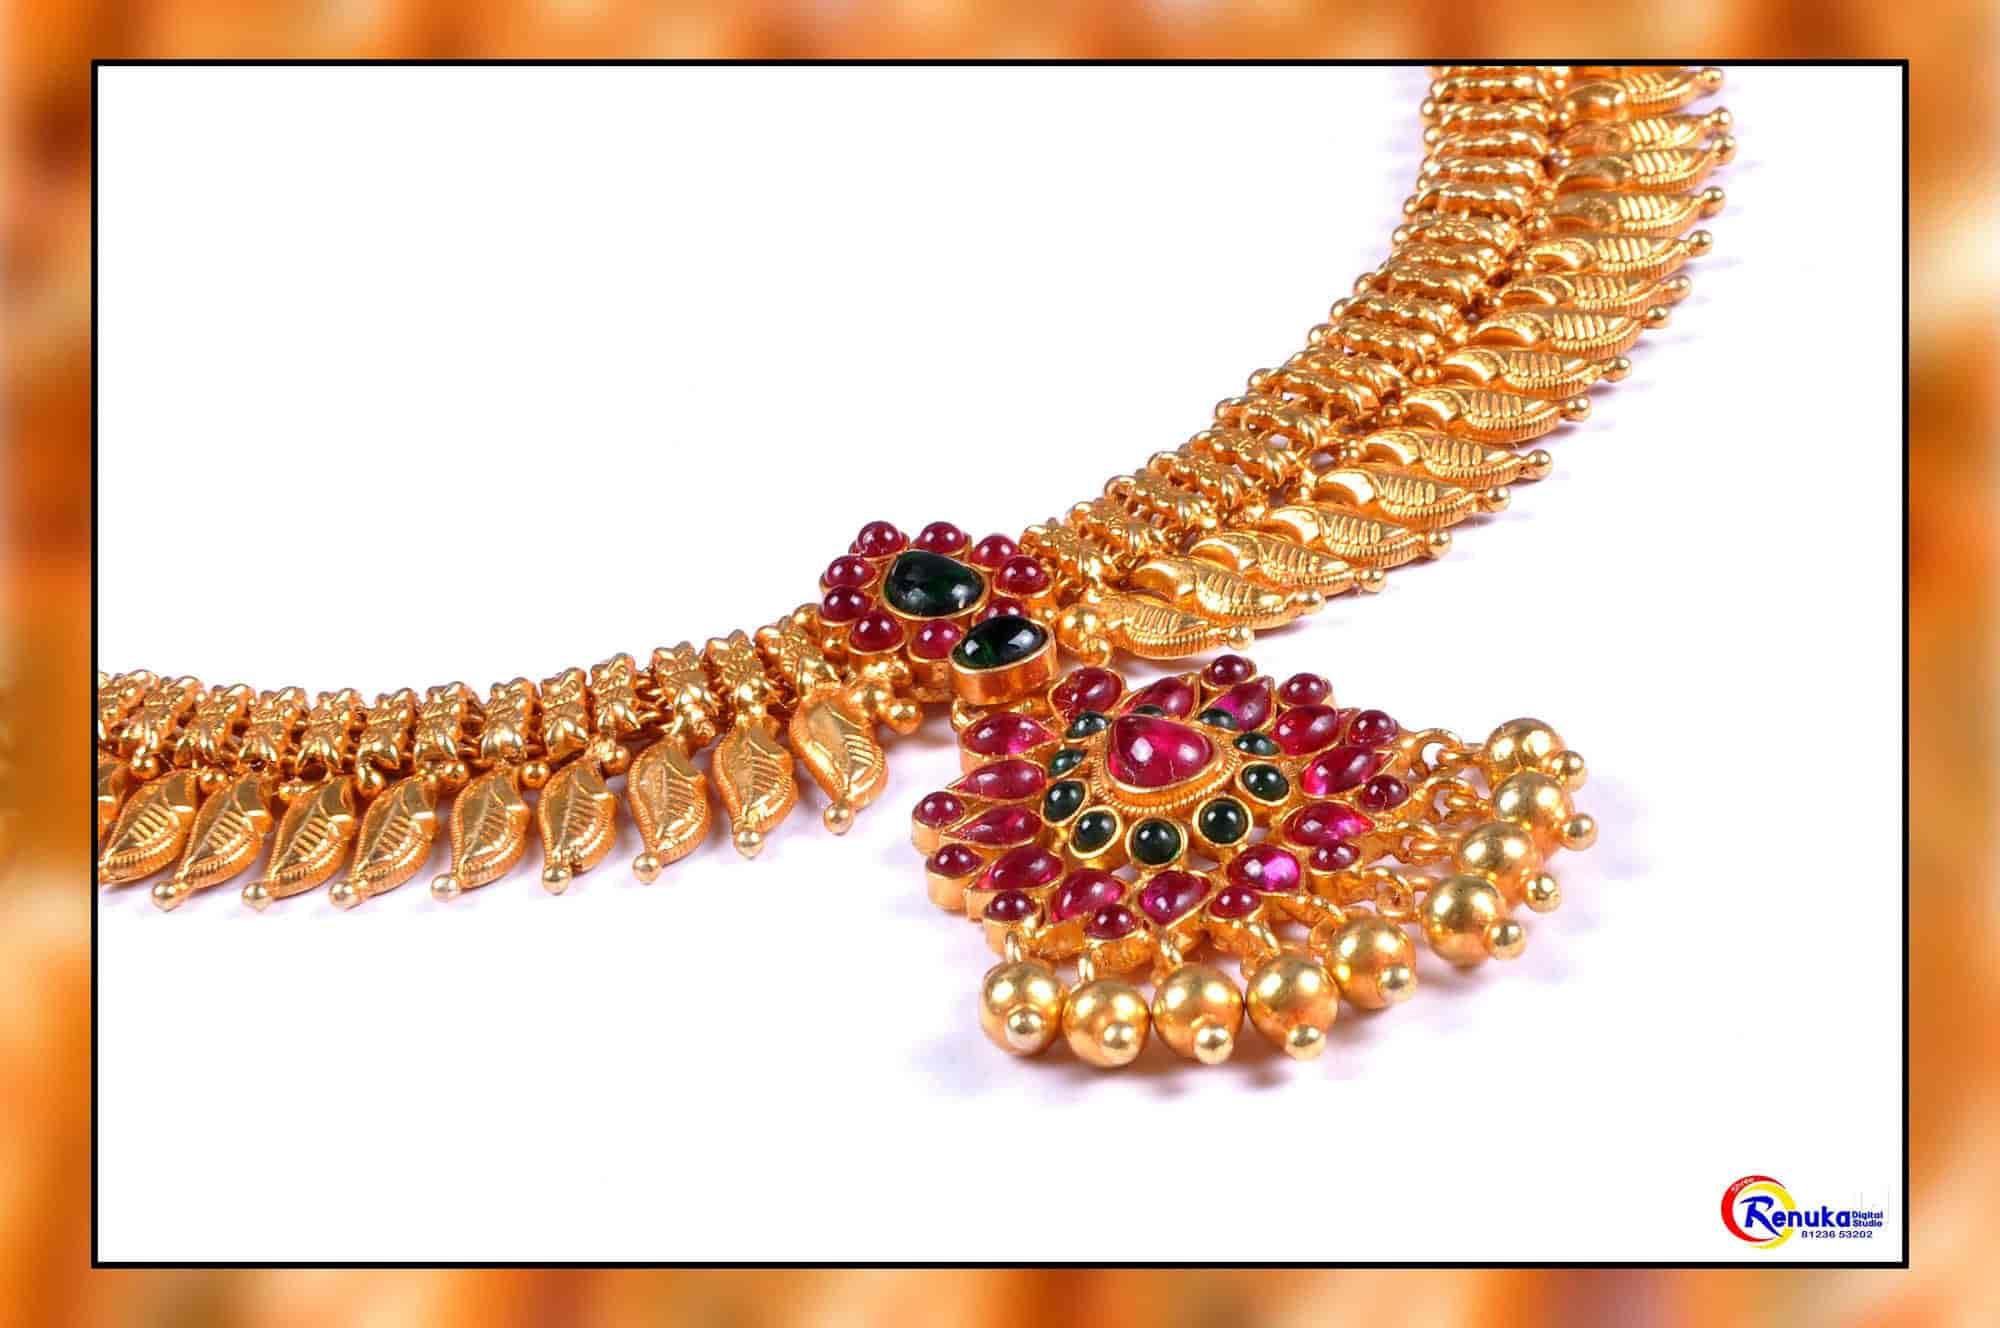 Raj Silver, Malleswaram - Silver Jewellery Showrooms in Bangalore